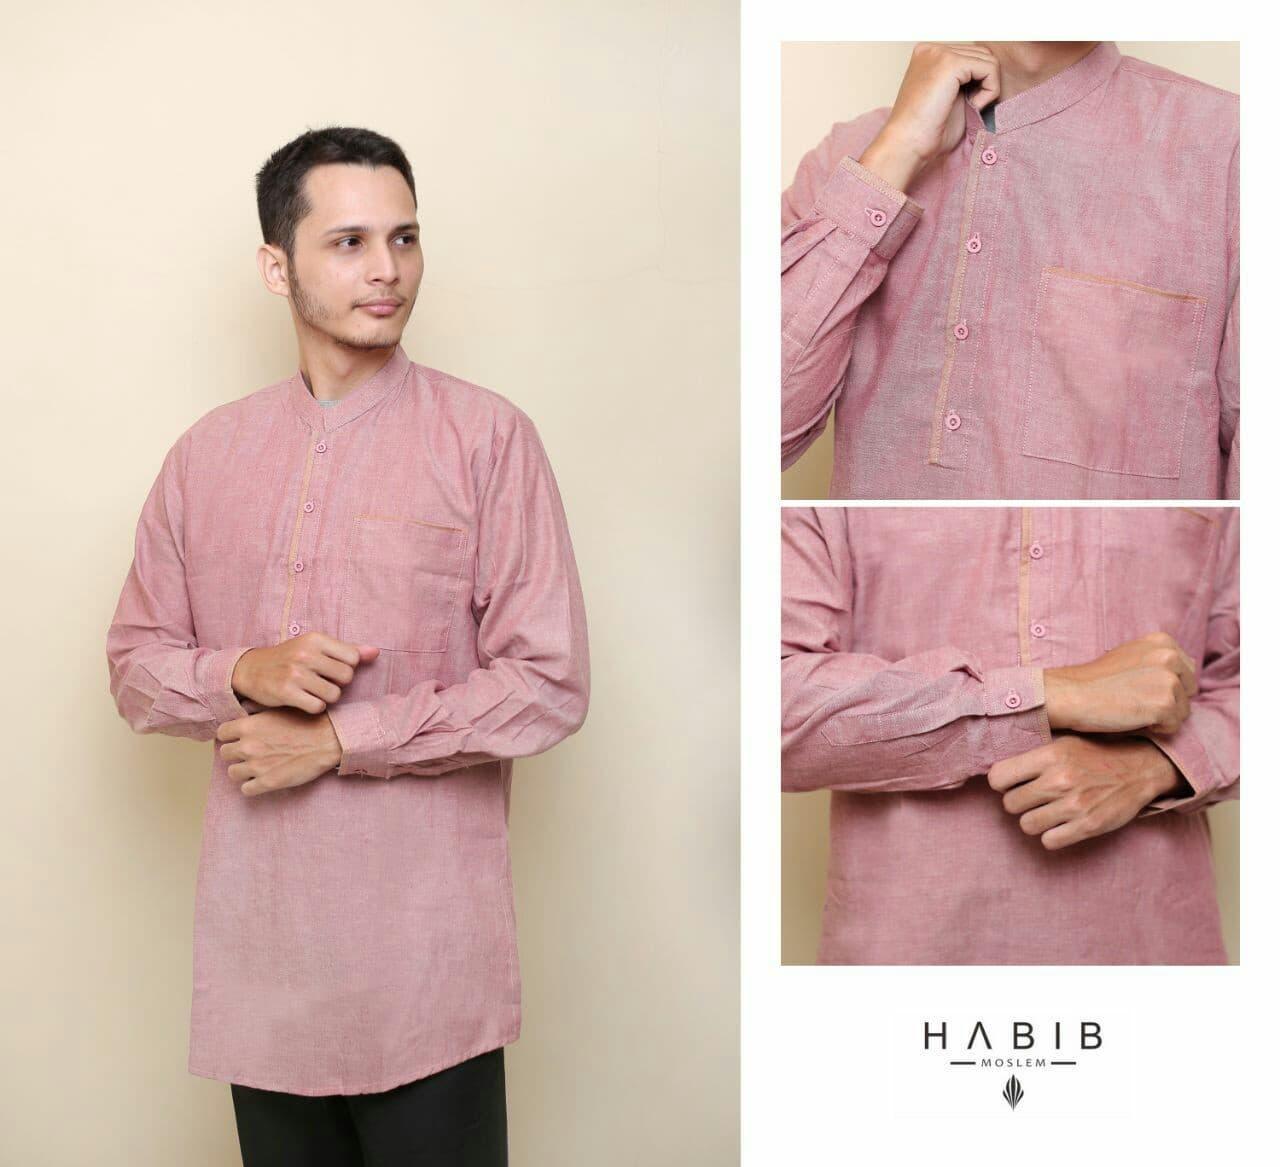 Baju Pria Kemeja Baju Koko Gaul Qurta List Habib Panjang Merah Muda